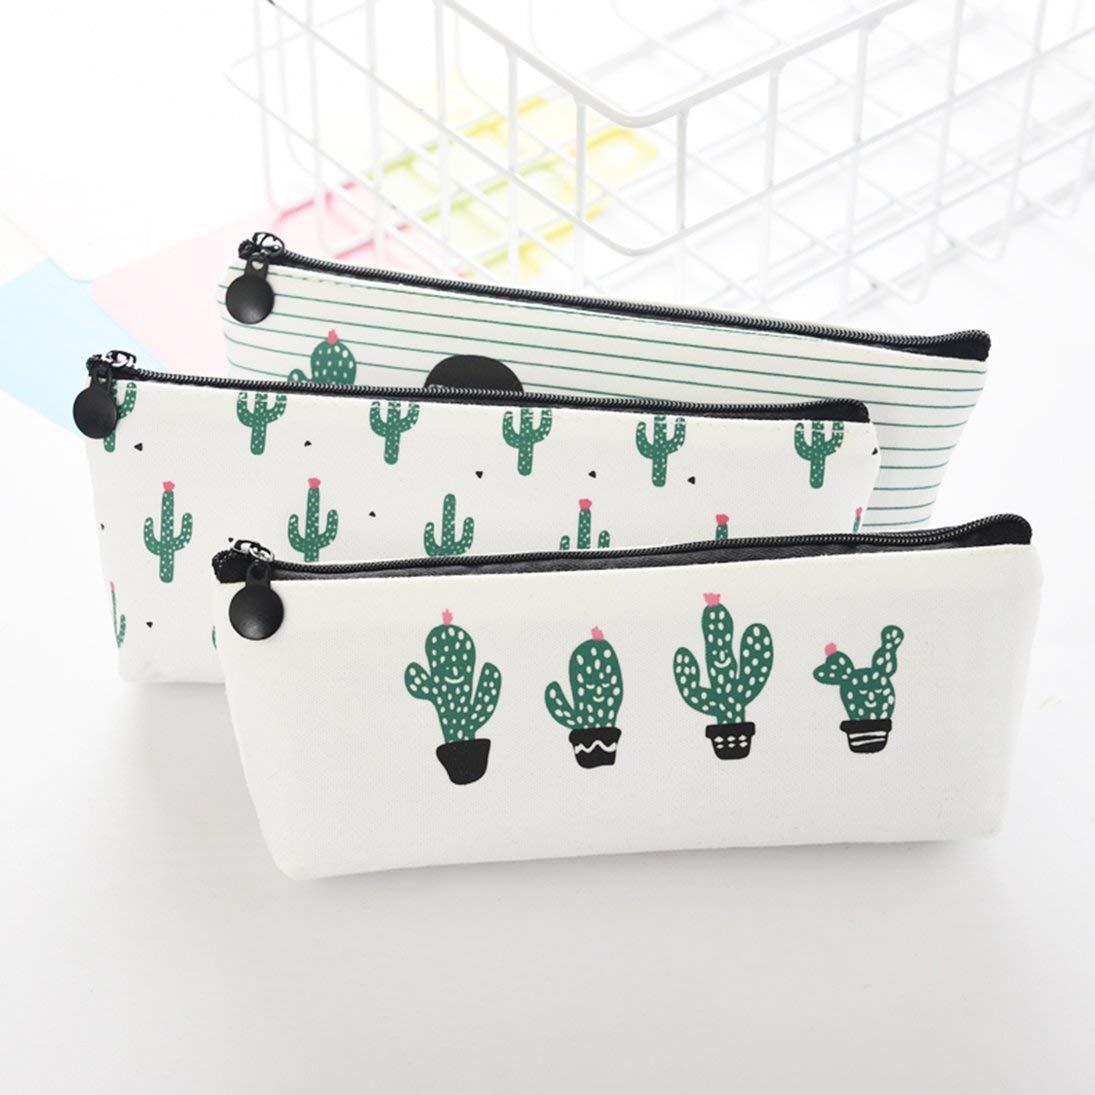 ToGames Cactus fresco y encantador Estuche de l/ápices de gran capacidad Estuche de l/ápices con cremallera para estudiantes Material de oficina escolar Papeler/ía de regalo